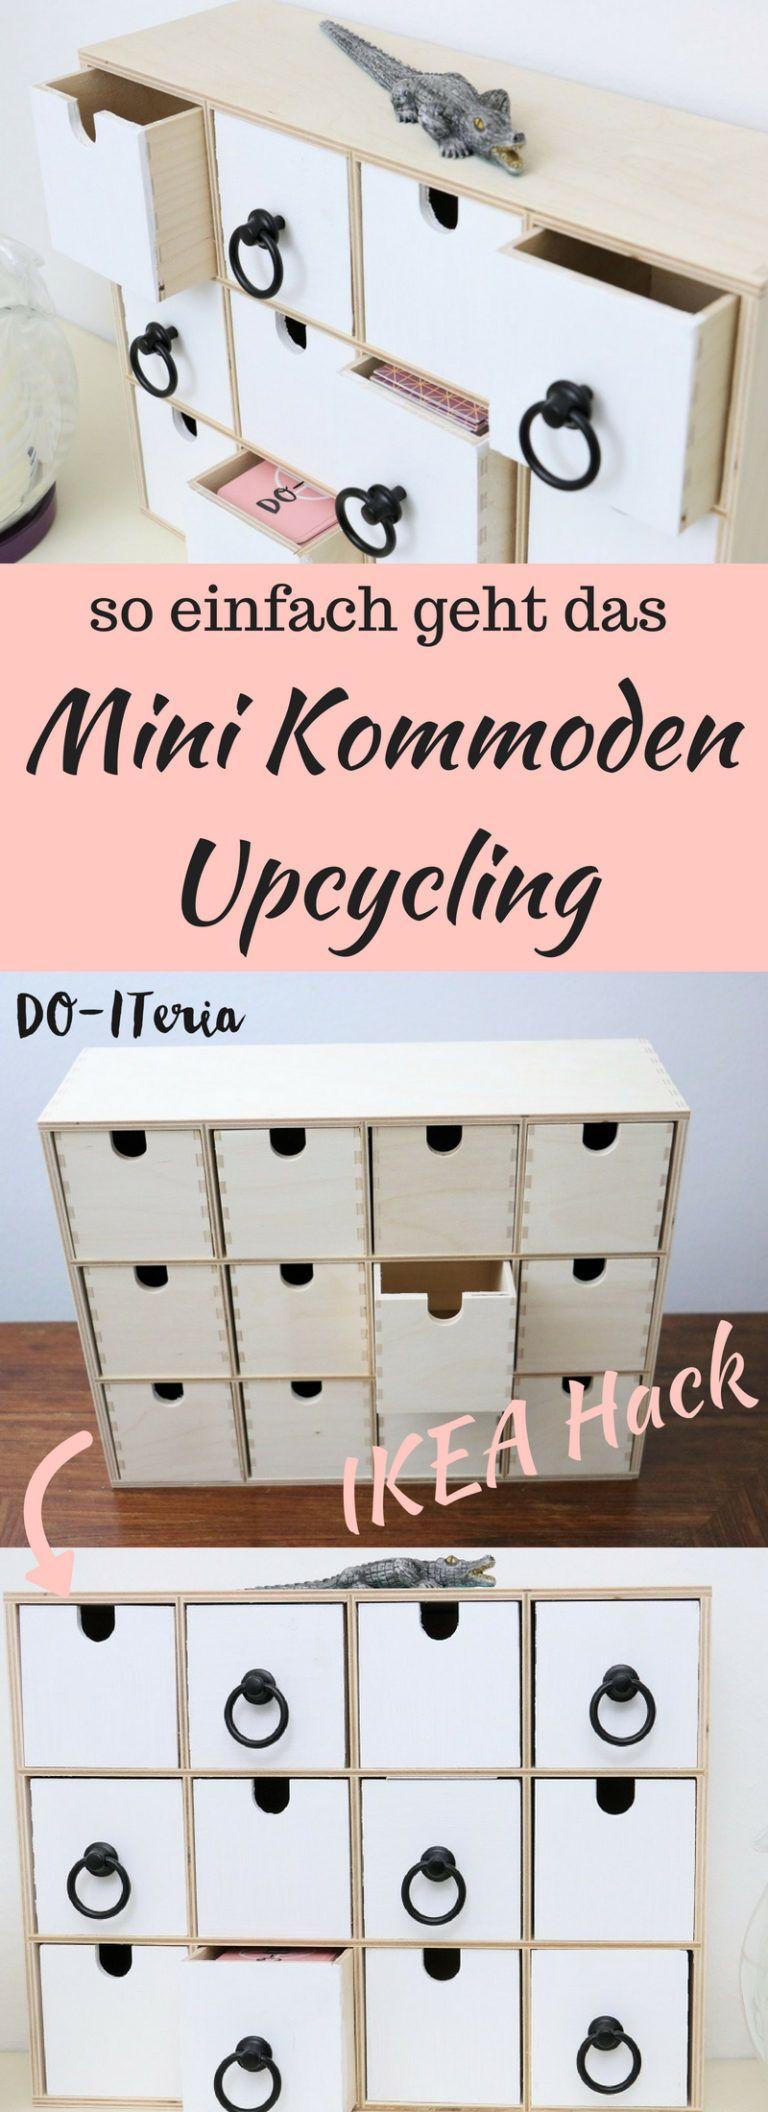 Ikea Hack: schickes Upcycling einer Mini Kommode #ikeahacks